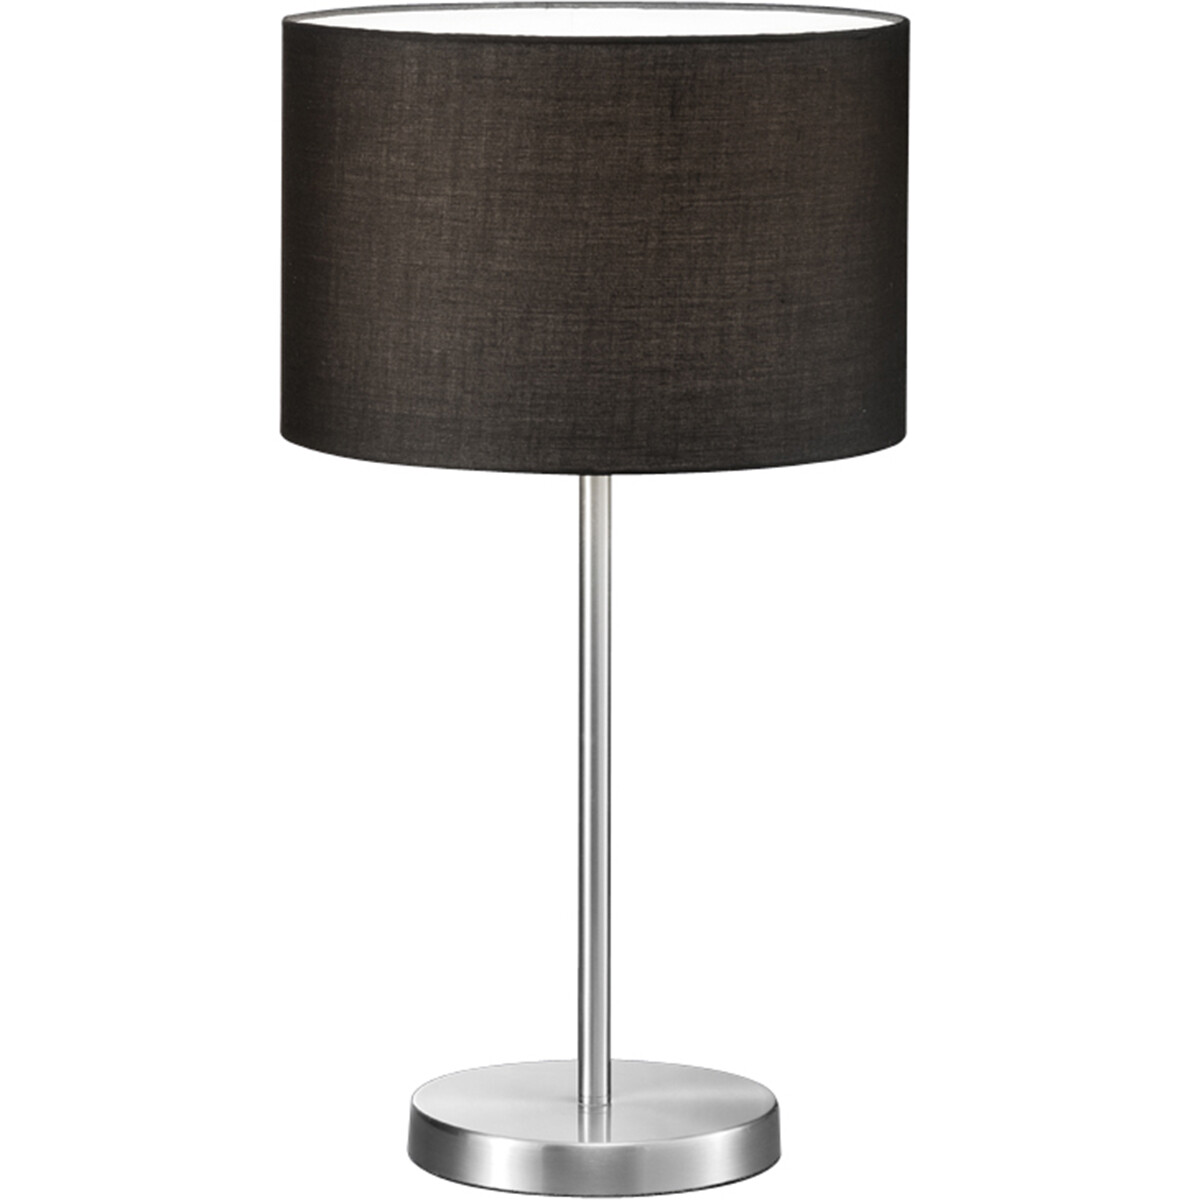 LED Tafellamp - Tafelverlichting - Trion Hotia - E27 Fitting - Rond - Mat Zwart - Aluminium